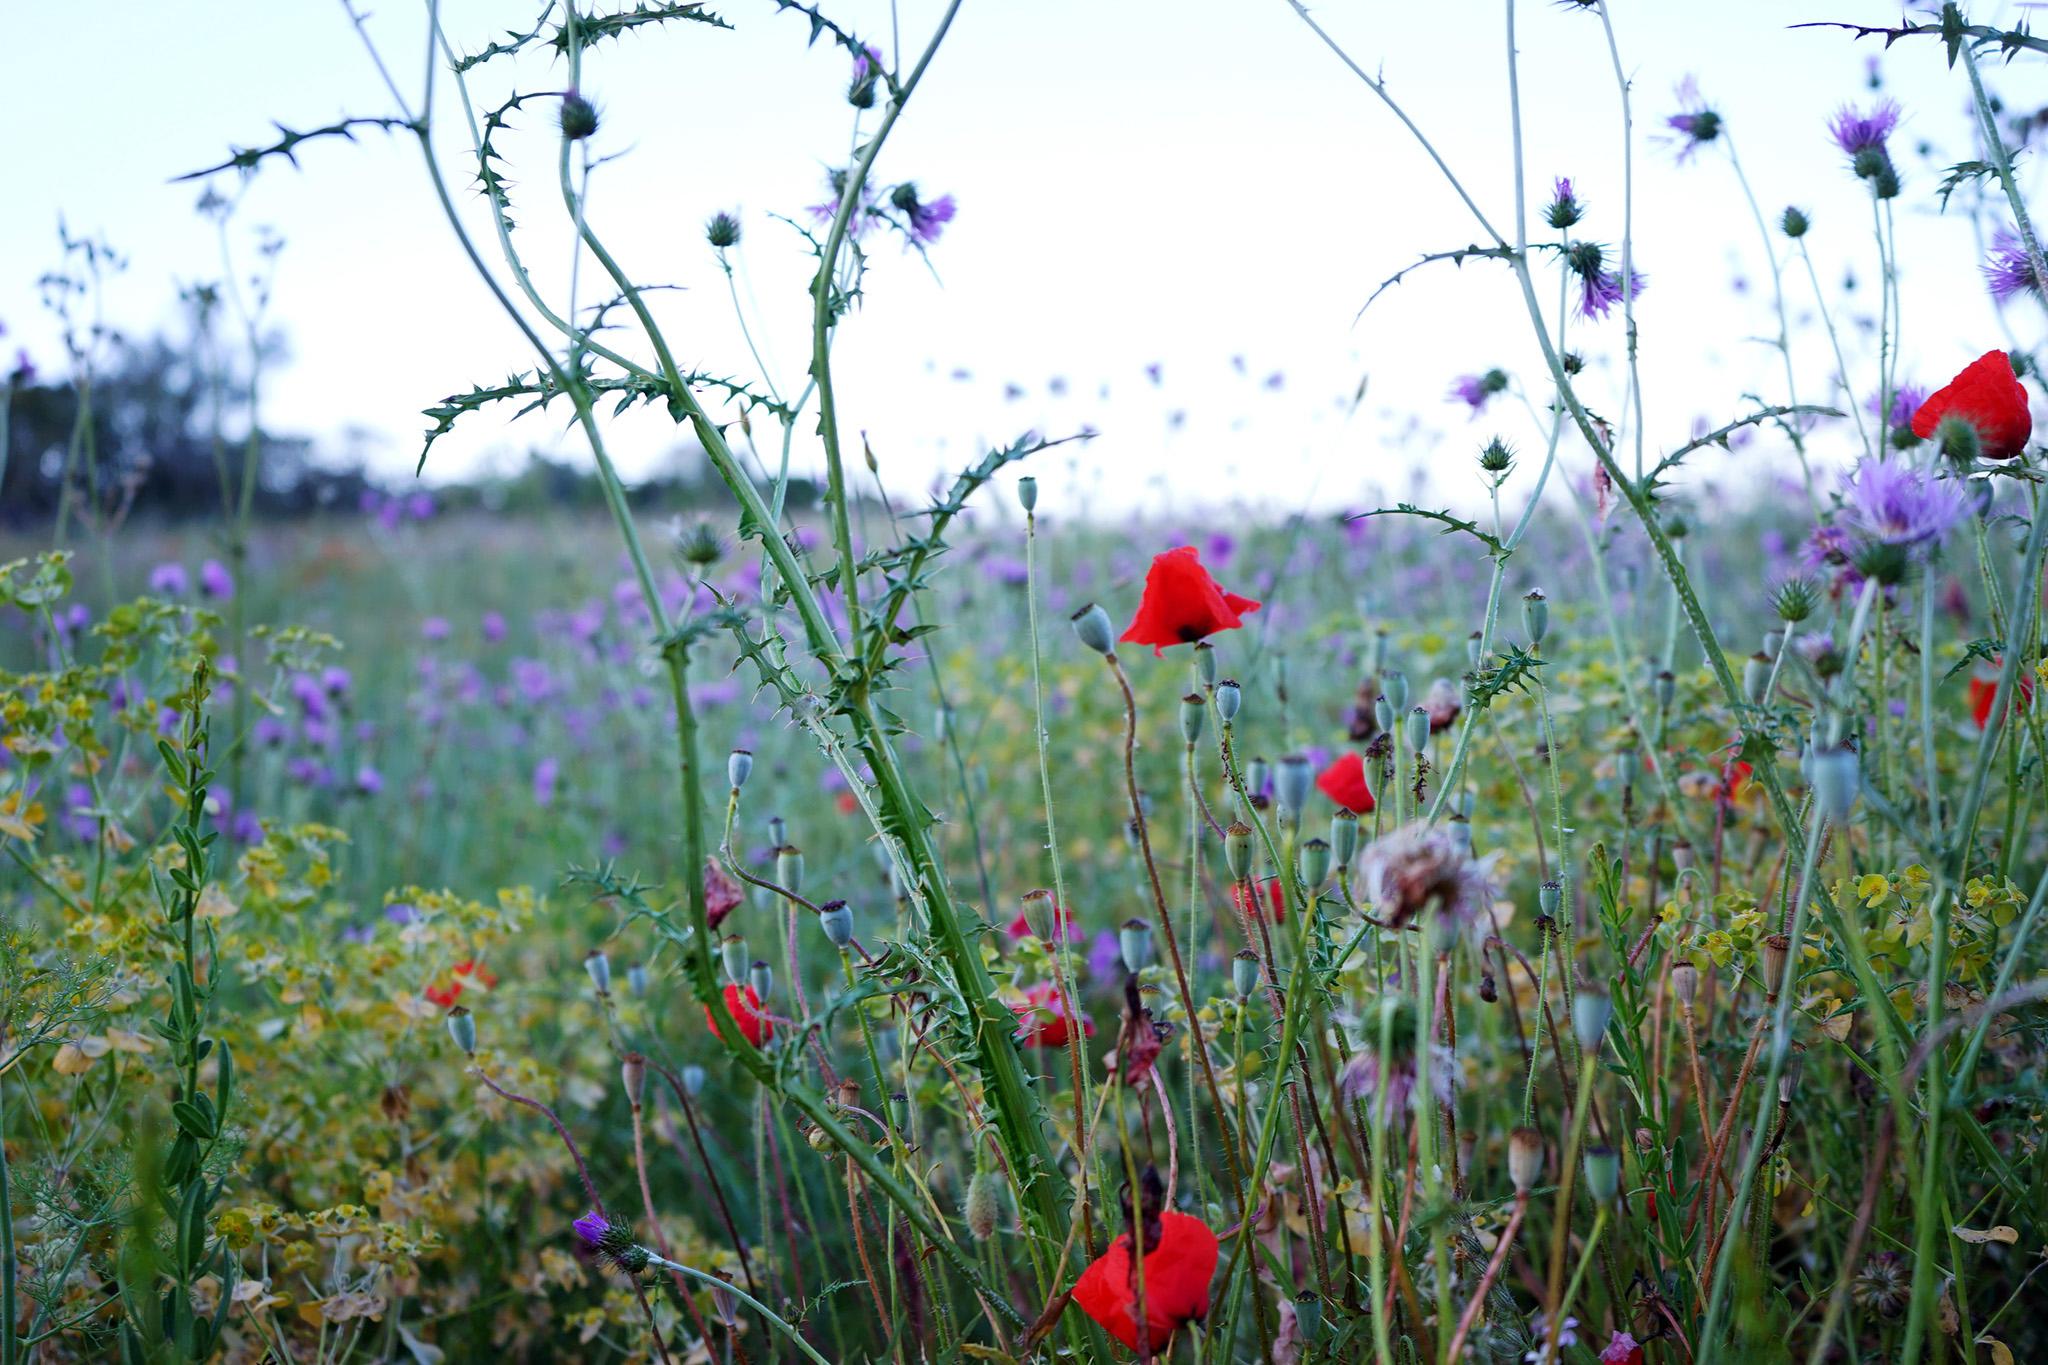 2017-04-Casa-Arte-Bad-Gastein - casa-arte-algarve-nectarandpulse-flowers-8.jpg